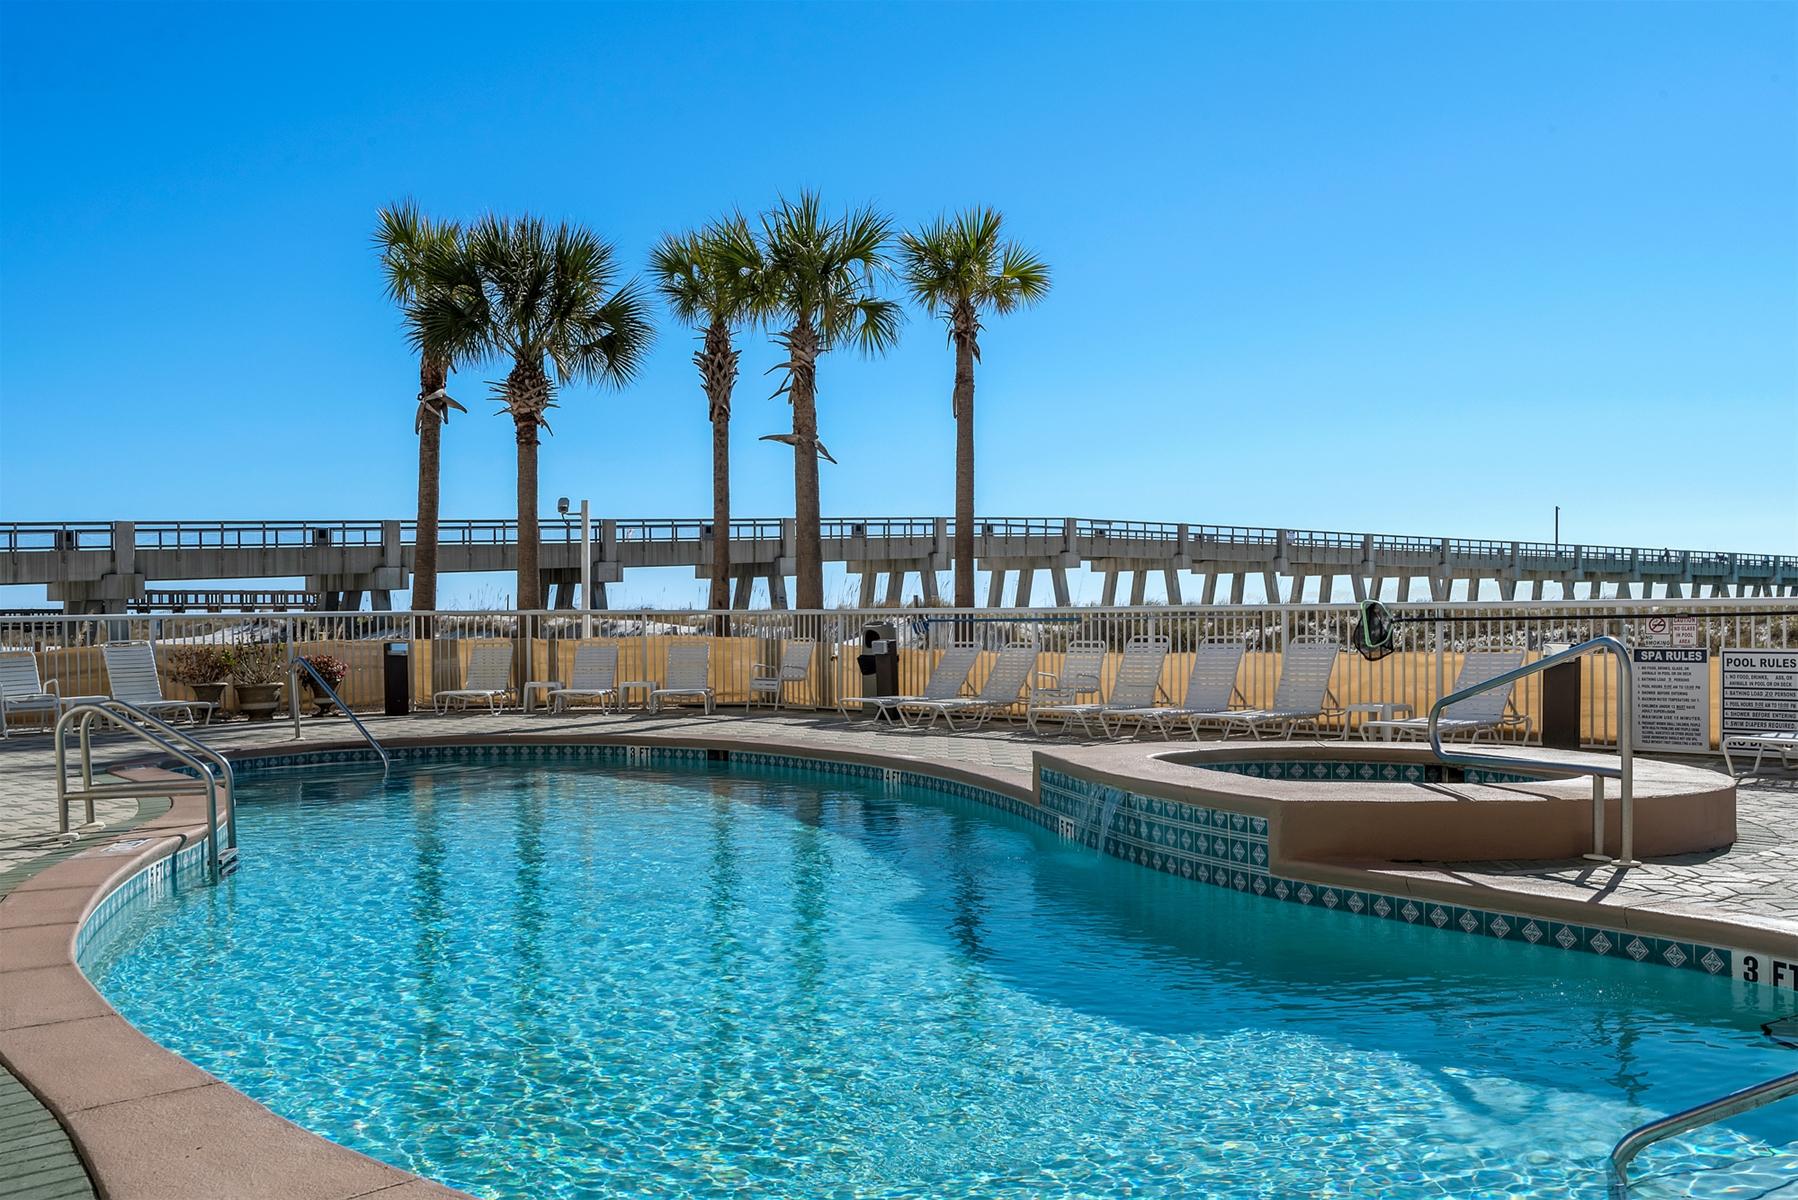 Summerwind Resort Navarre FL Pool Area